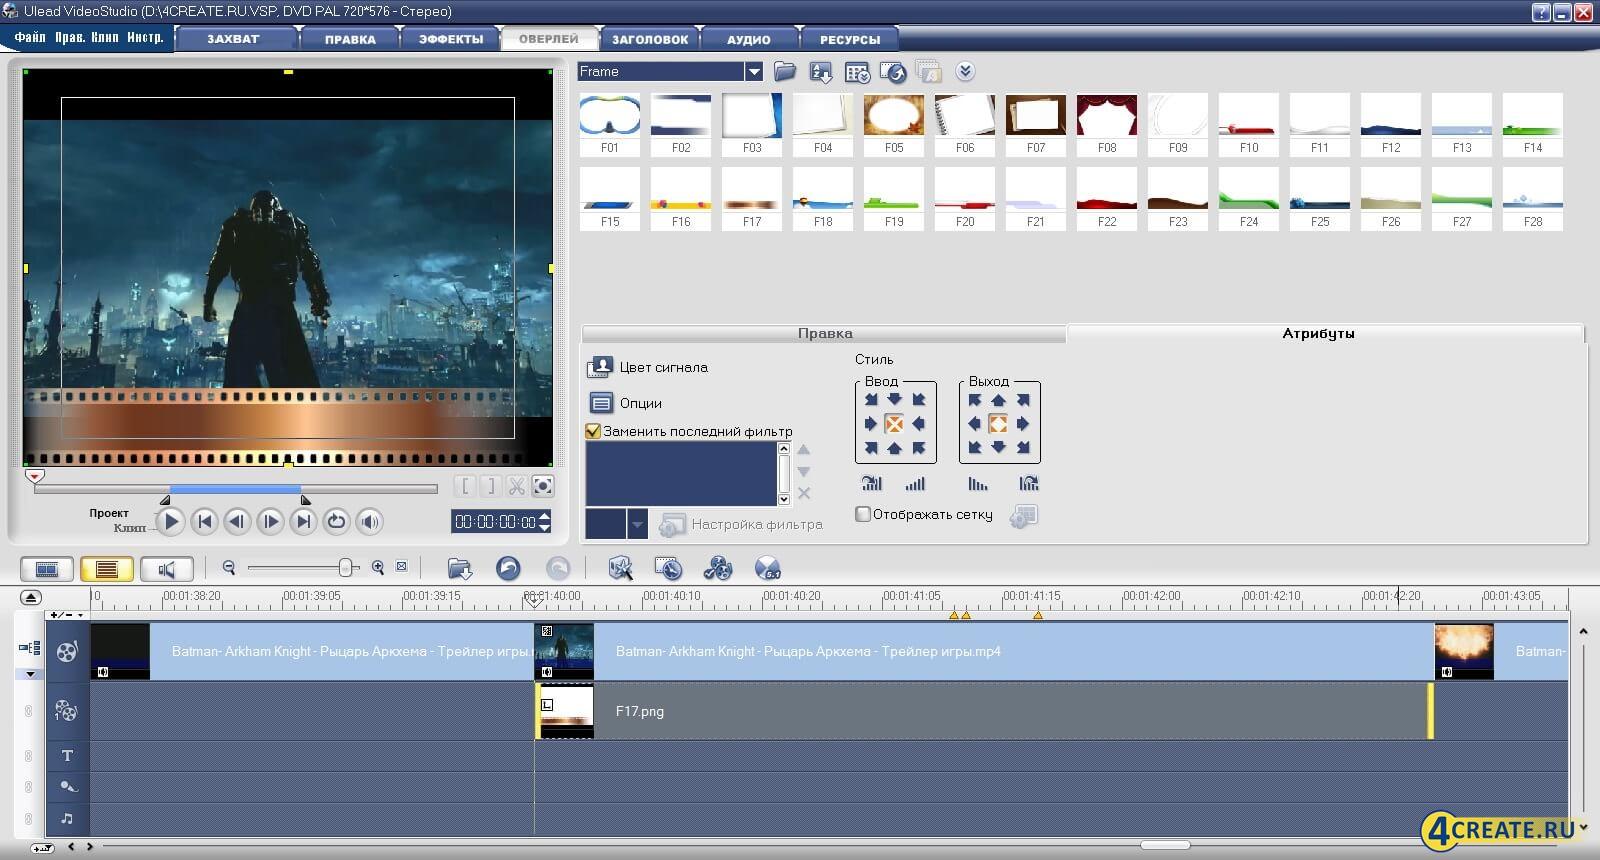 Ulead VideoStudio 11.5 (Скриншот 4)